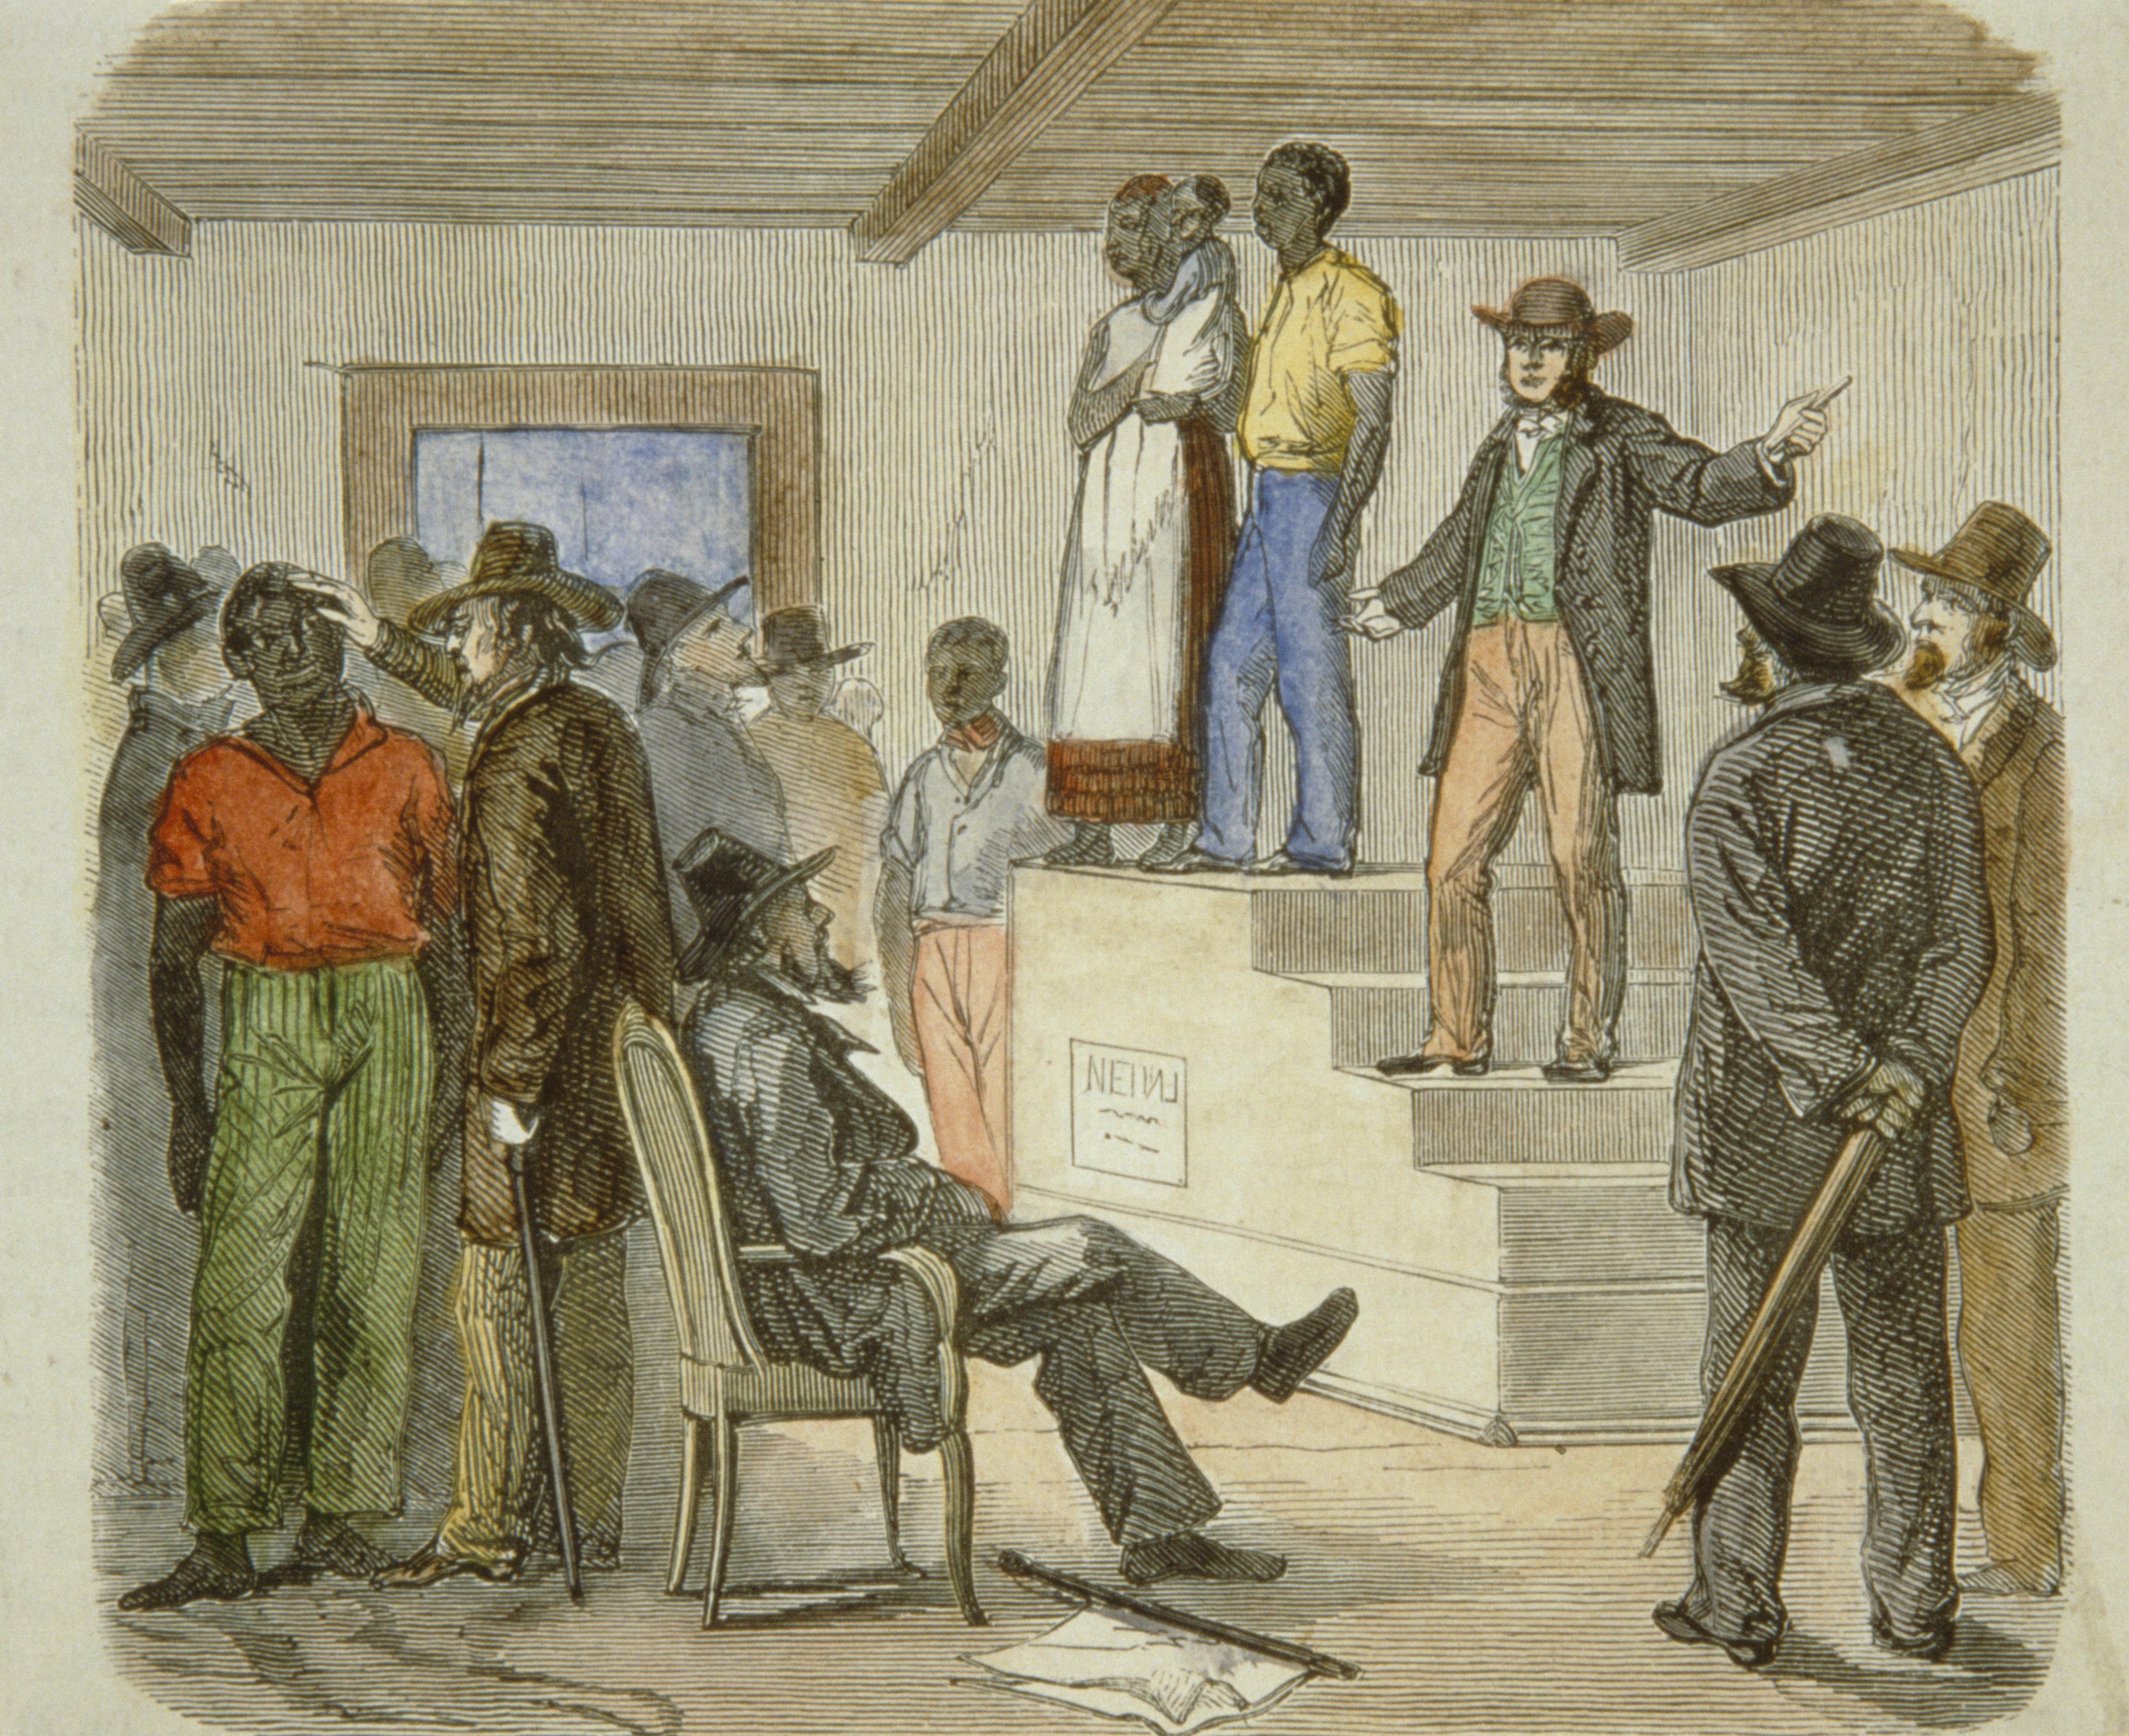 Slave auction circa 1861. (Credit: API/Gamma-Rapho/Getty Images)